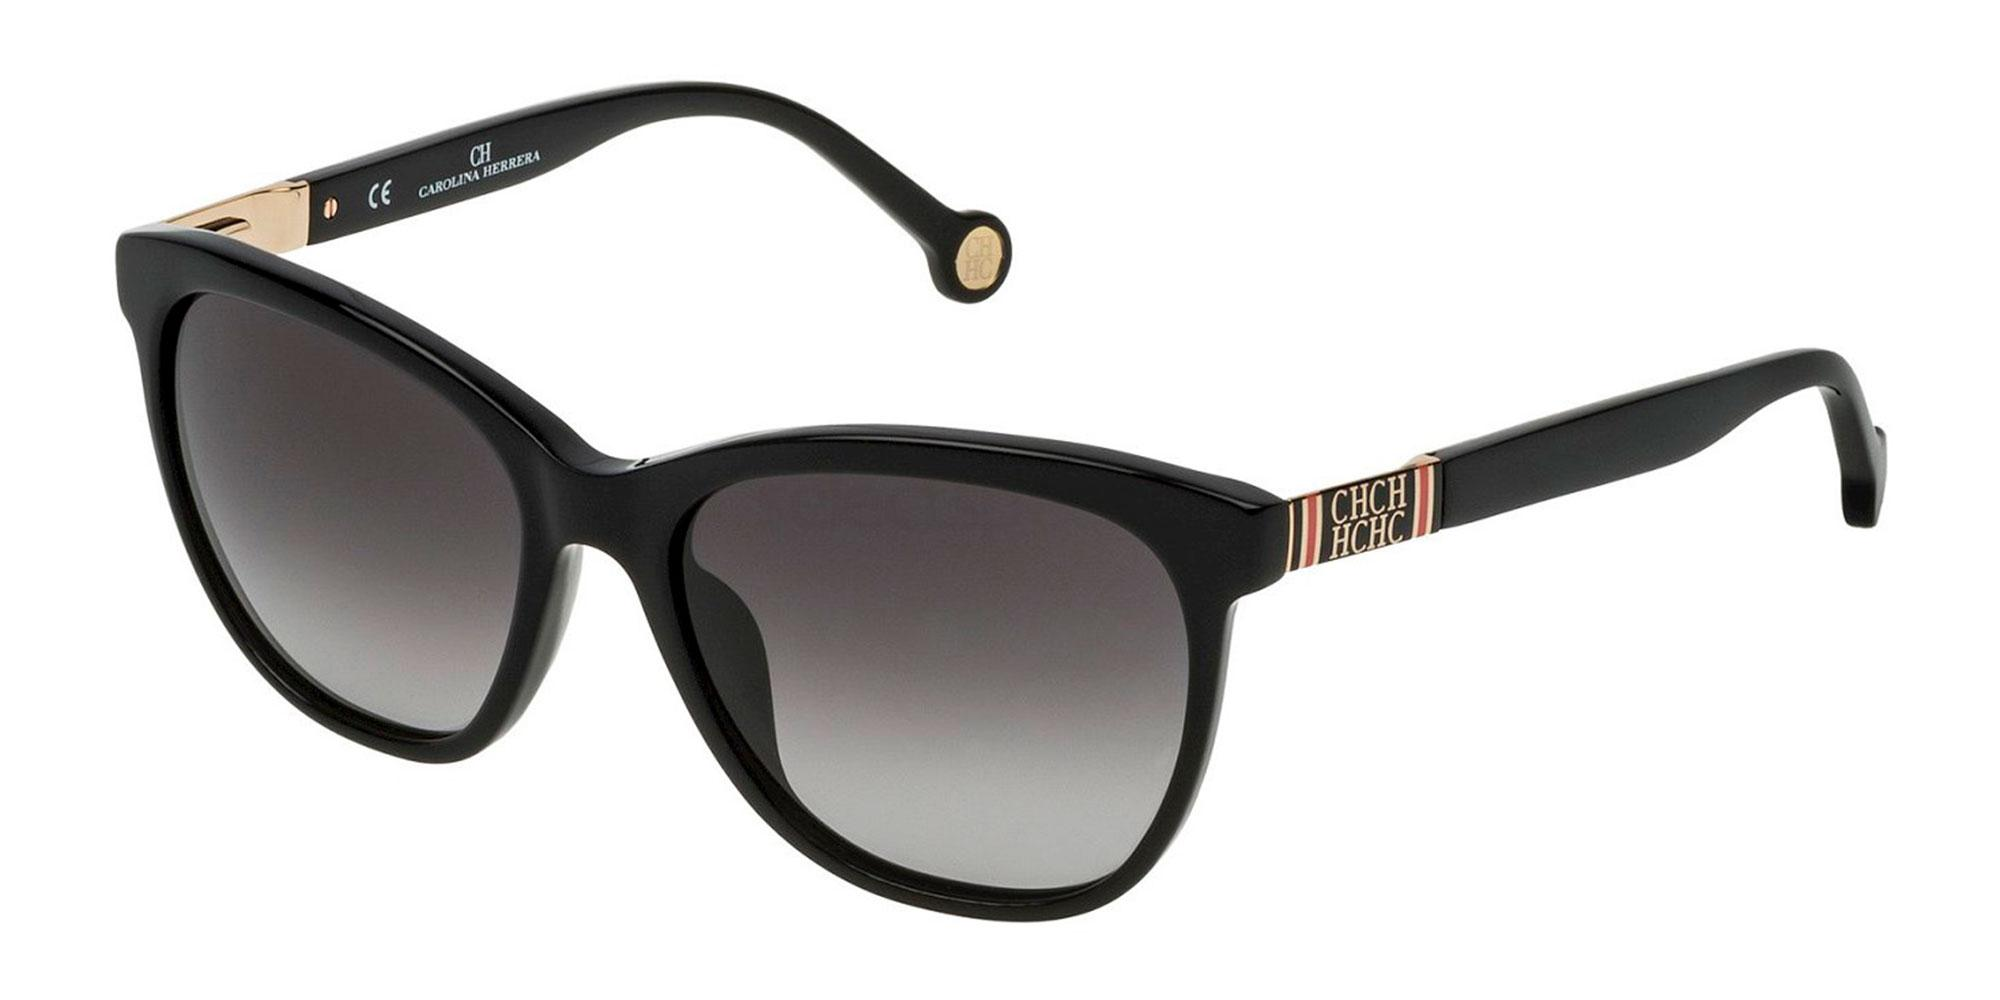 0700 SHE691 Sunglasses, CH Carolina Herrera